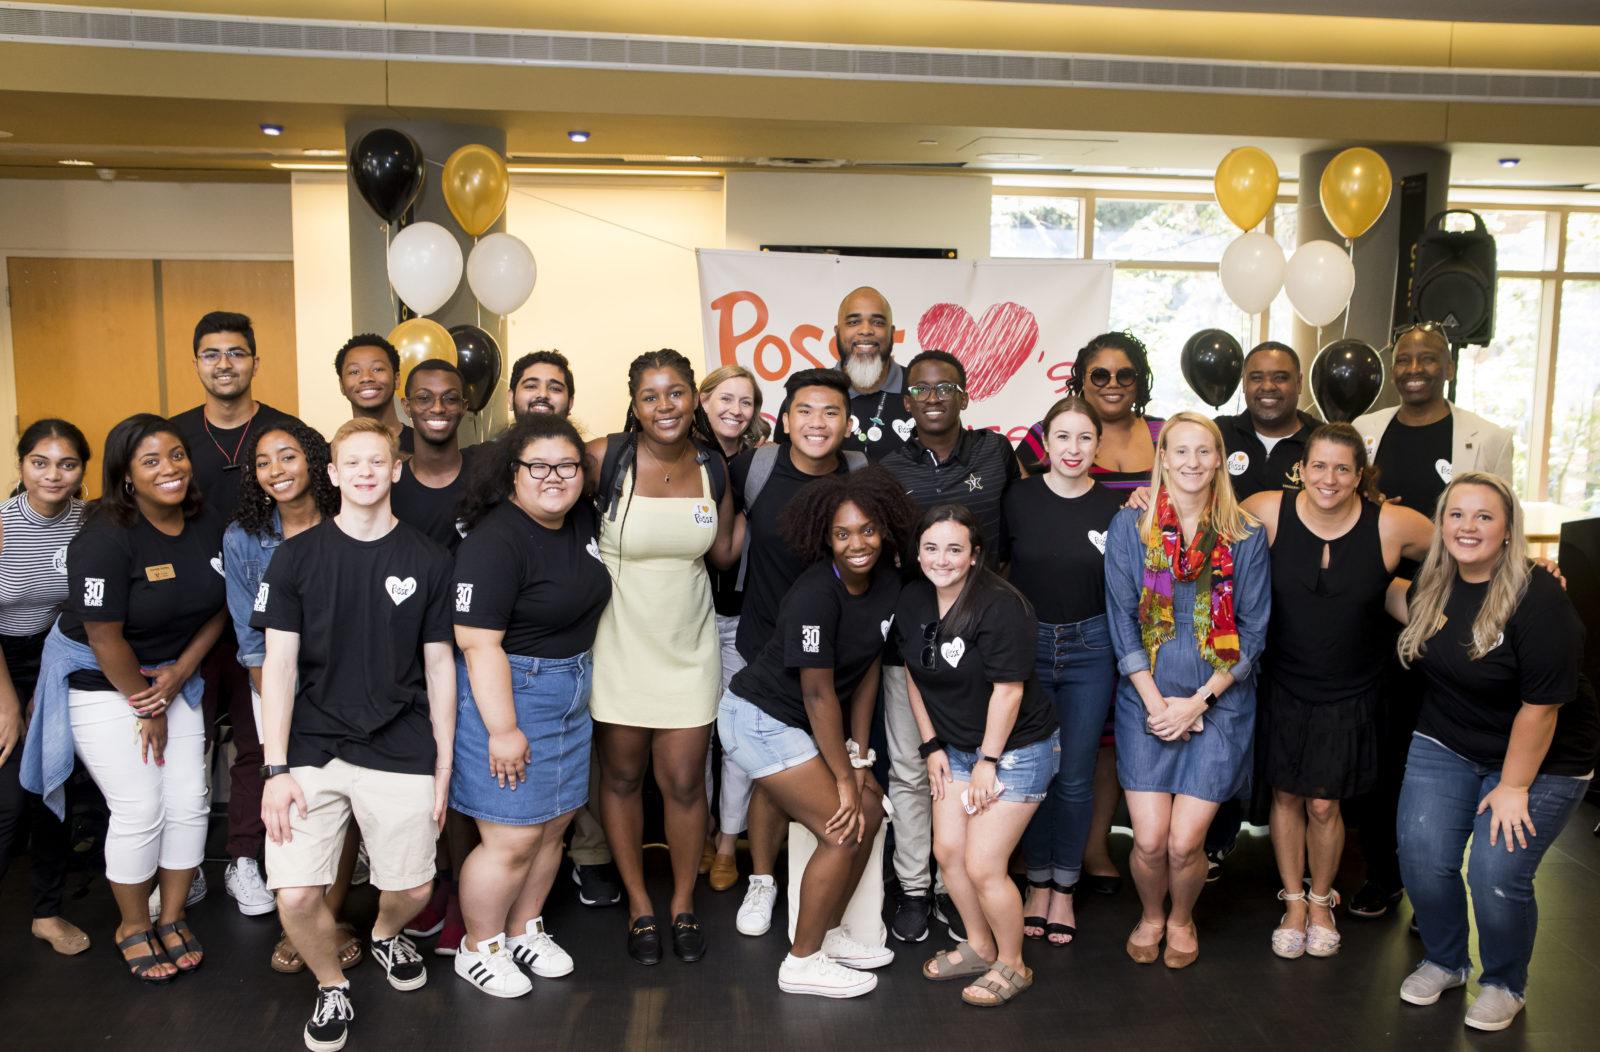 Posse Scholars program celebrates their 30th anniversary at the Sarratt Student Center Promenade. (Susan Urmy/Vanderbilt)